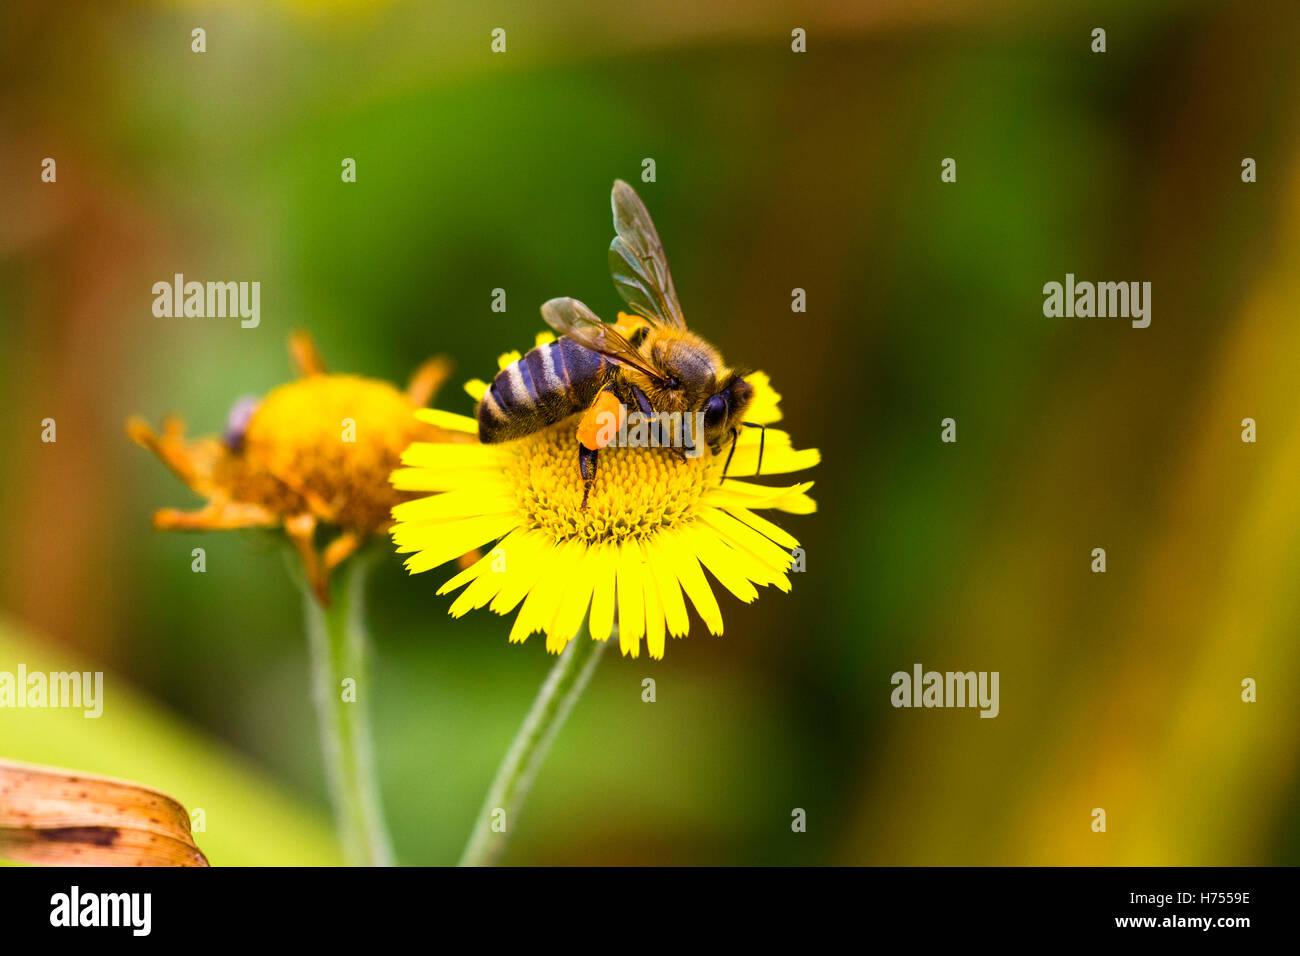 Honey bee with corbicula full of pollen - Stock Image